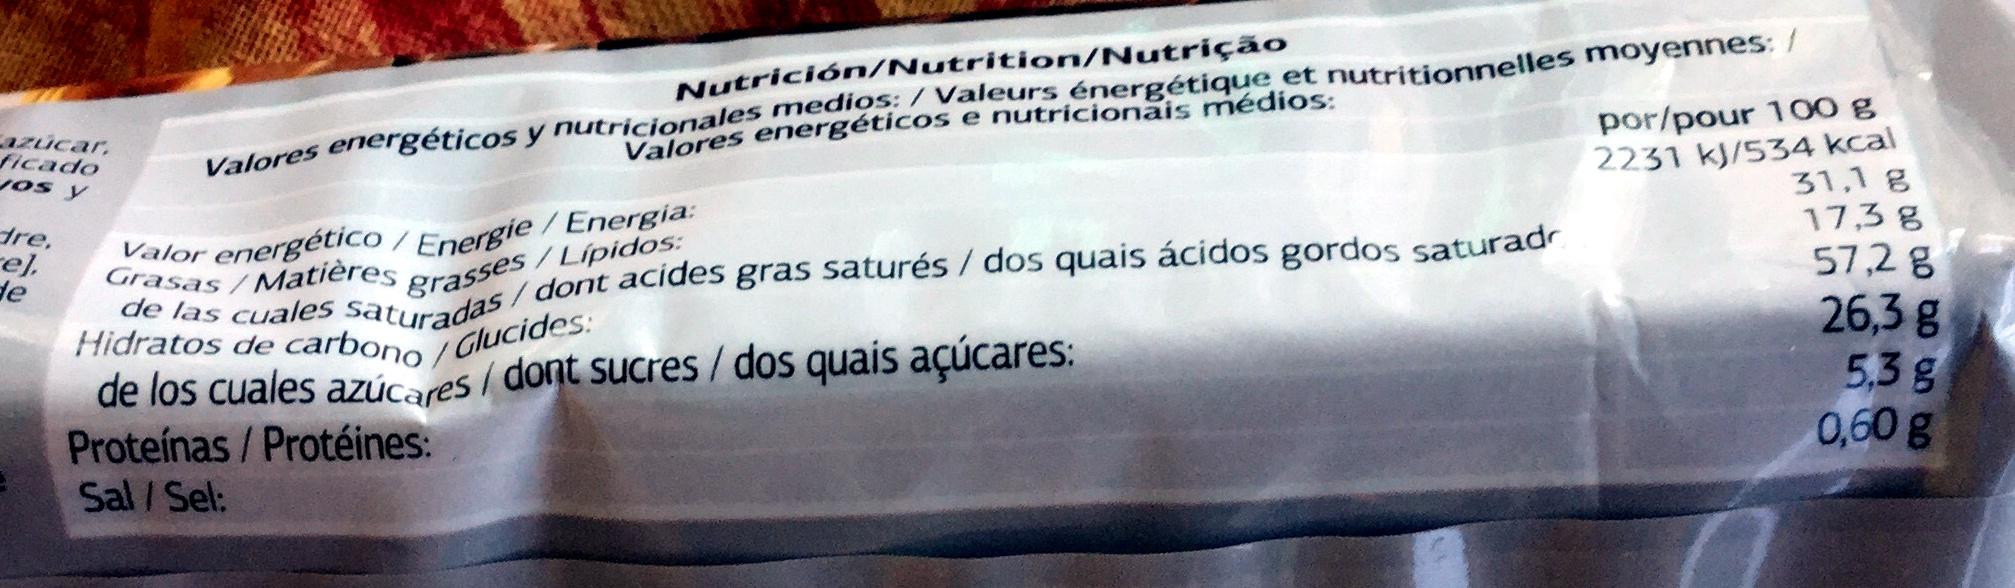 Sprits - chocolat au lait - Información nutricional - fr